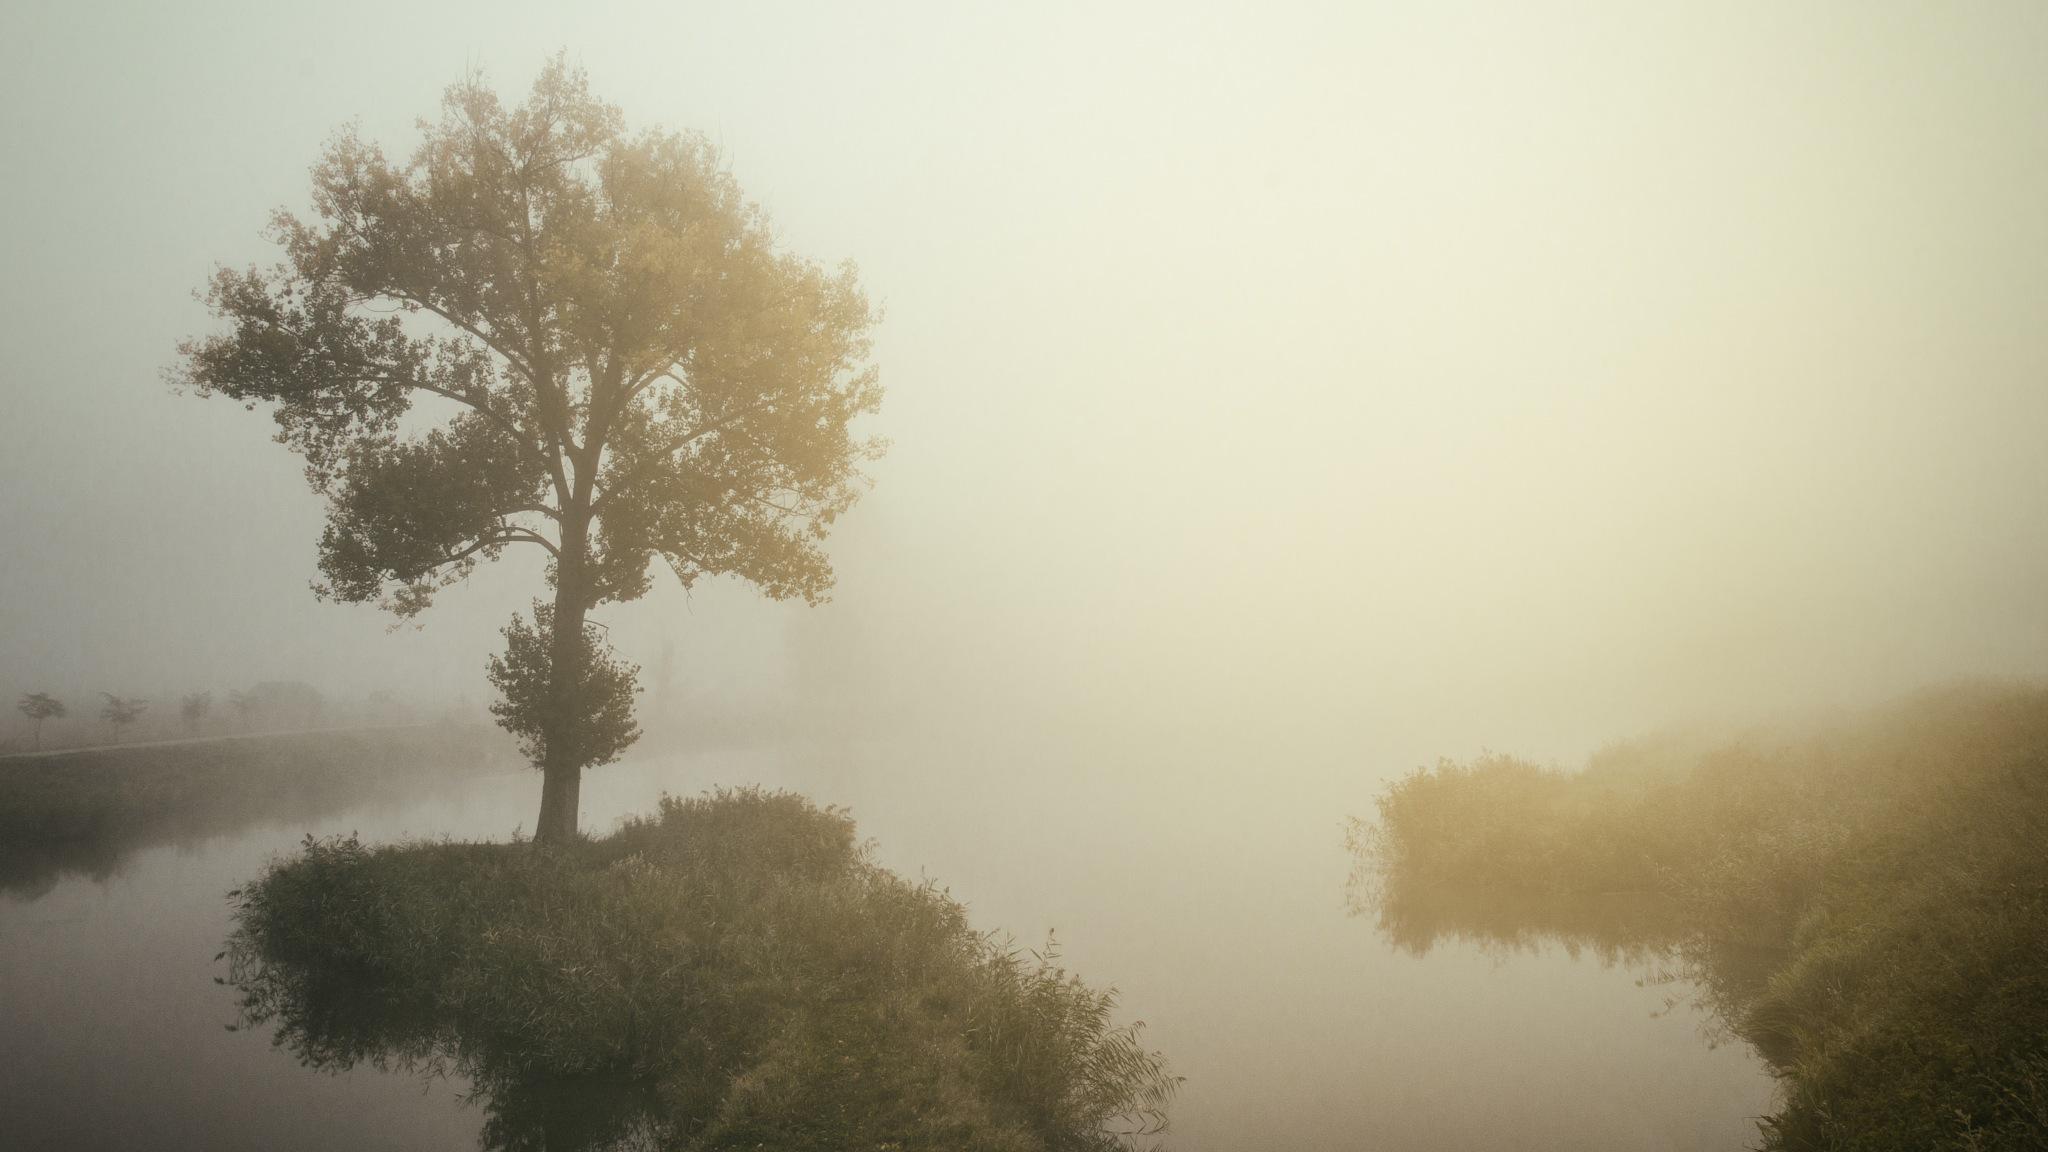 Fog on lake by Nenad Milic